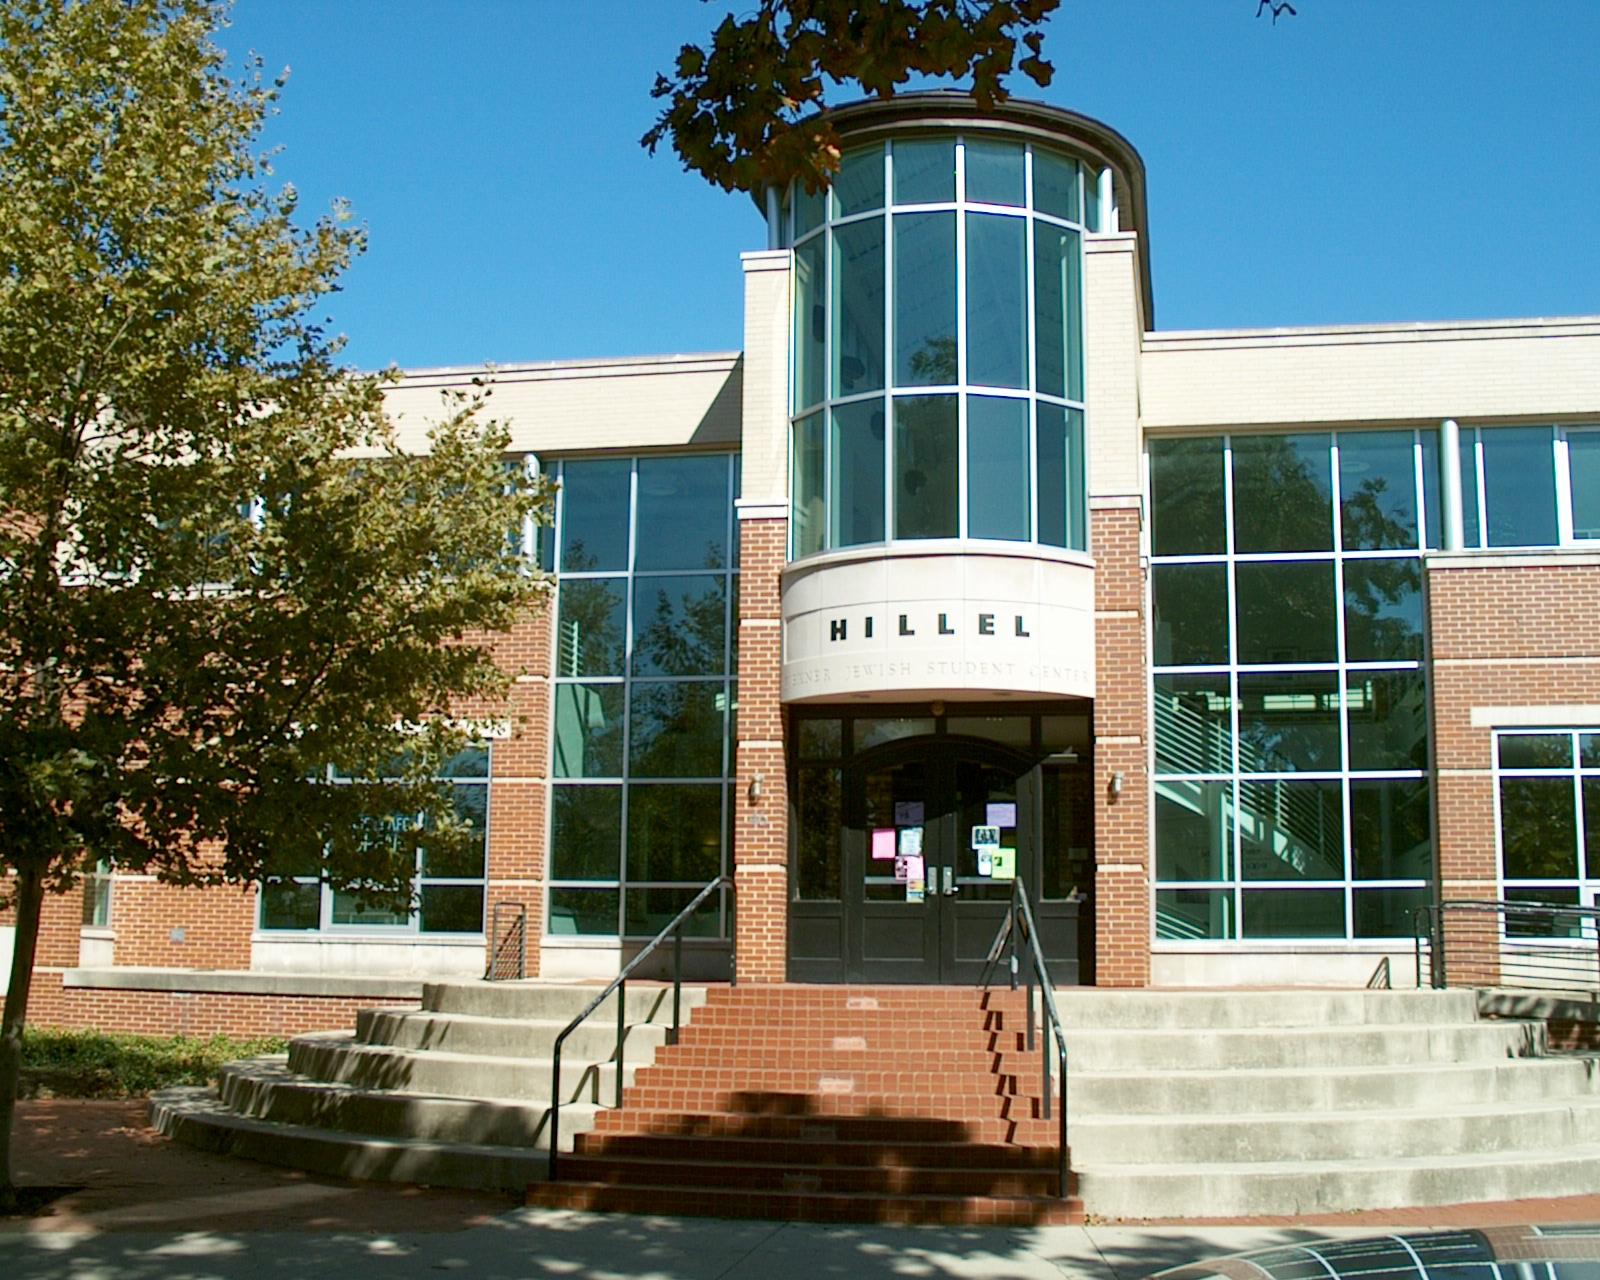 the ohio state university hillel foundation